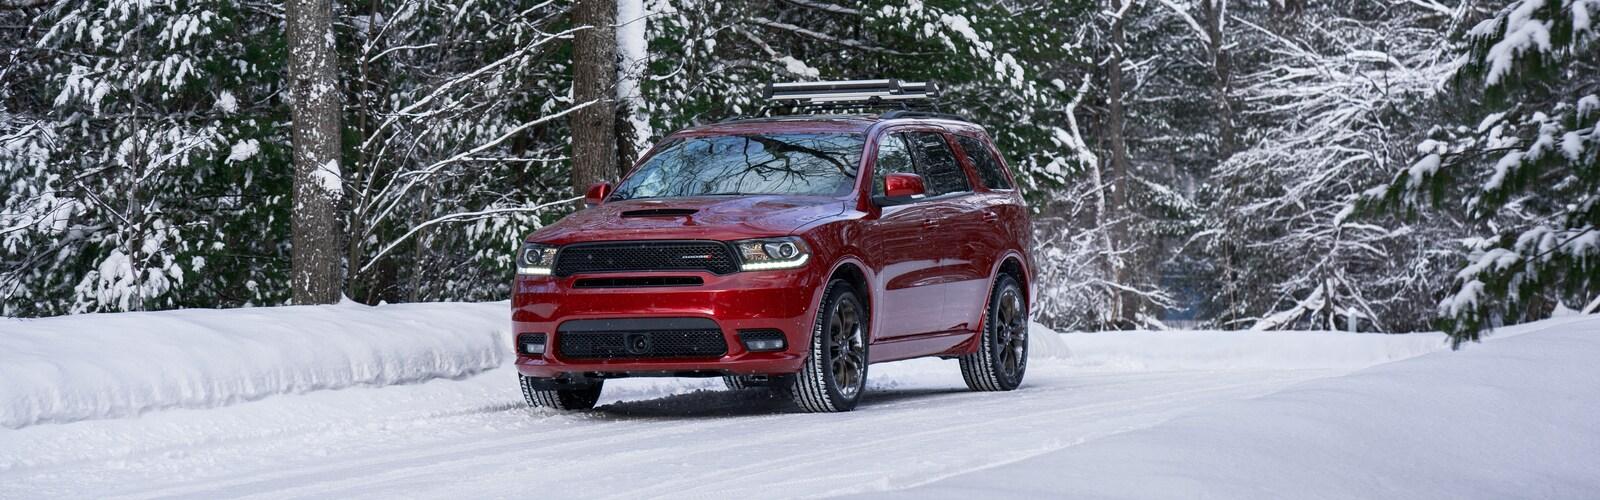 Landers Benton Ar >> Landers Chrysler Dodge Jeep Ram FIAT   New Dodge, Jeep ...